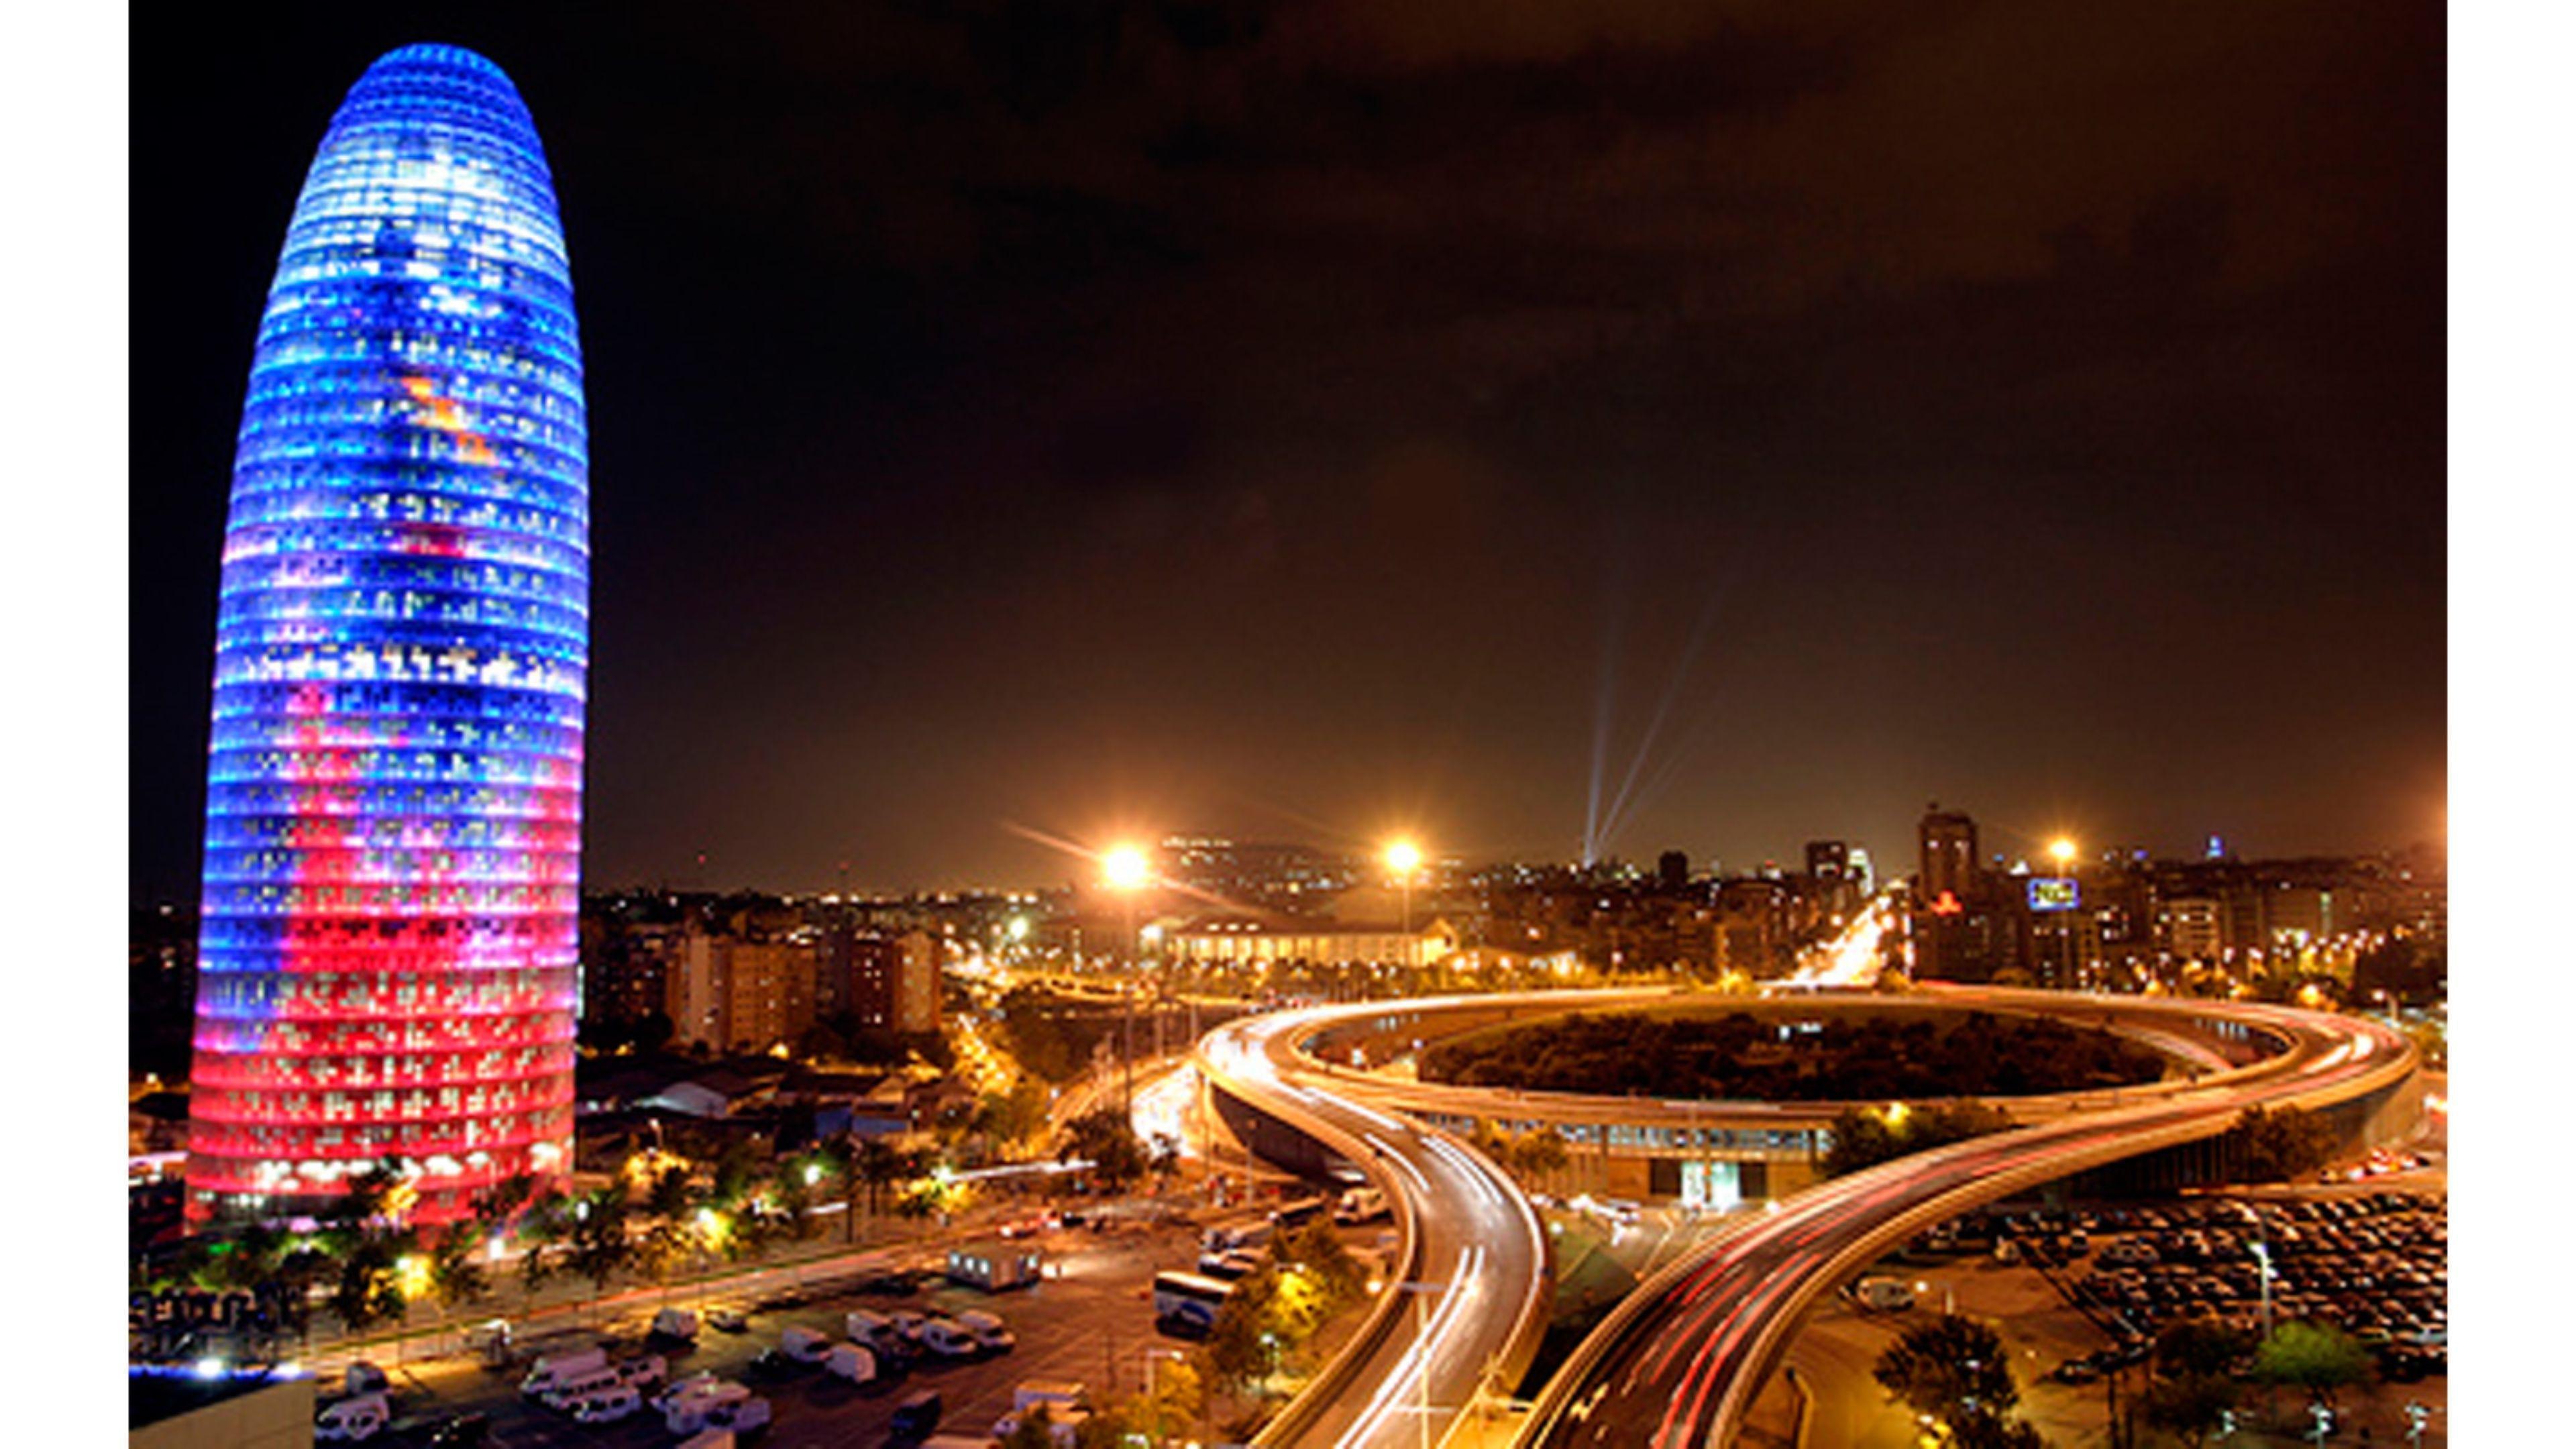 historical barcelona spain 4k - photo #7